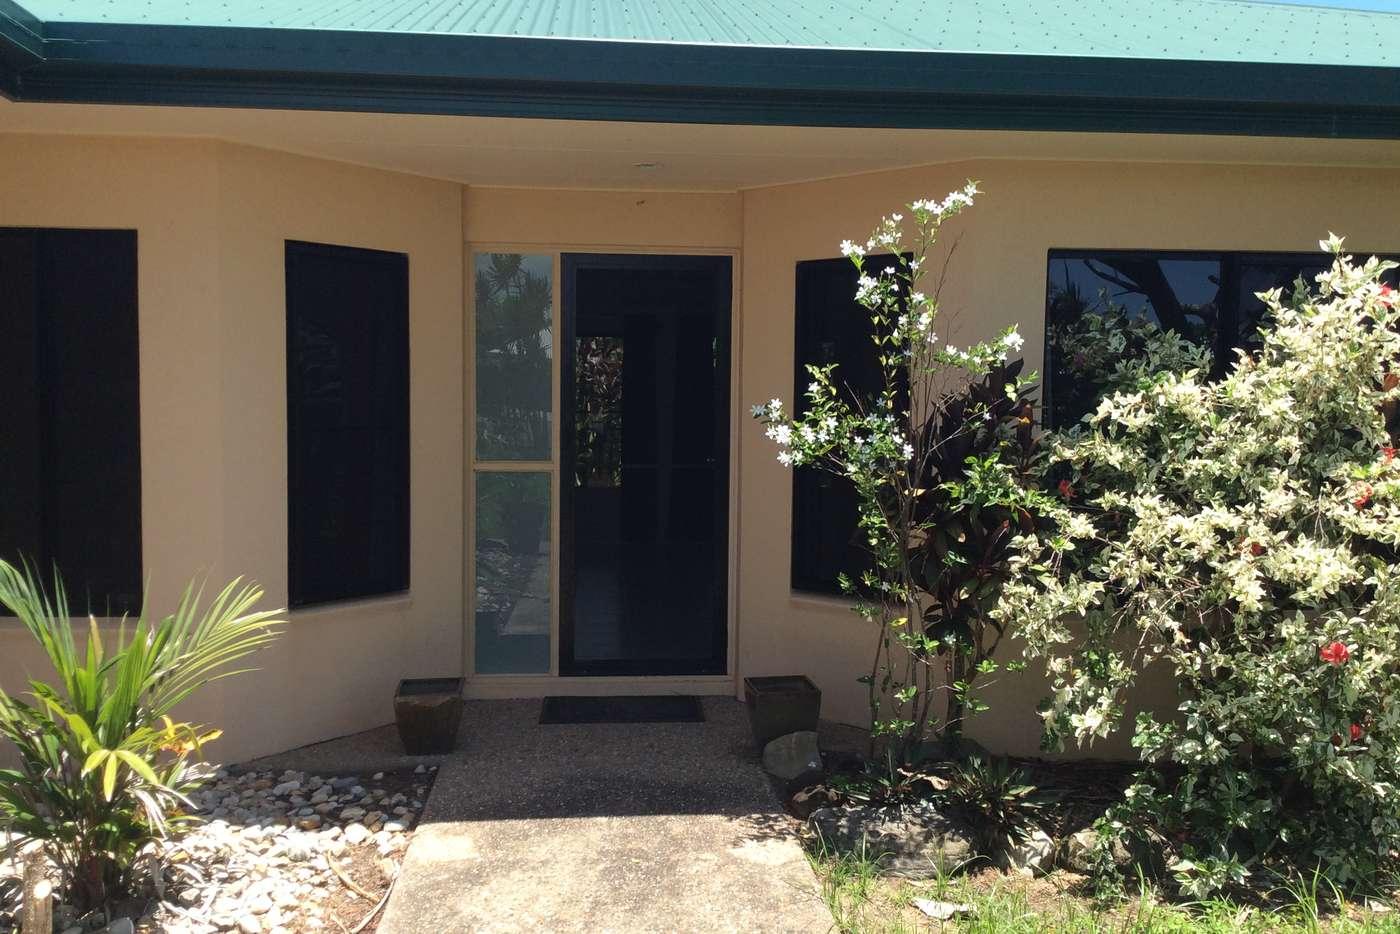 Main view of Homely house listing, 37 Cooya Beach Road, Cooya Beach QLD 4873